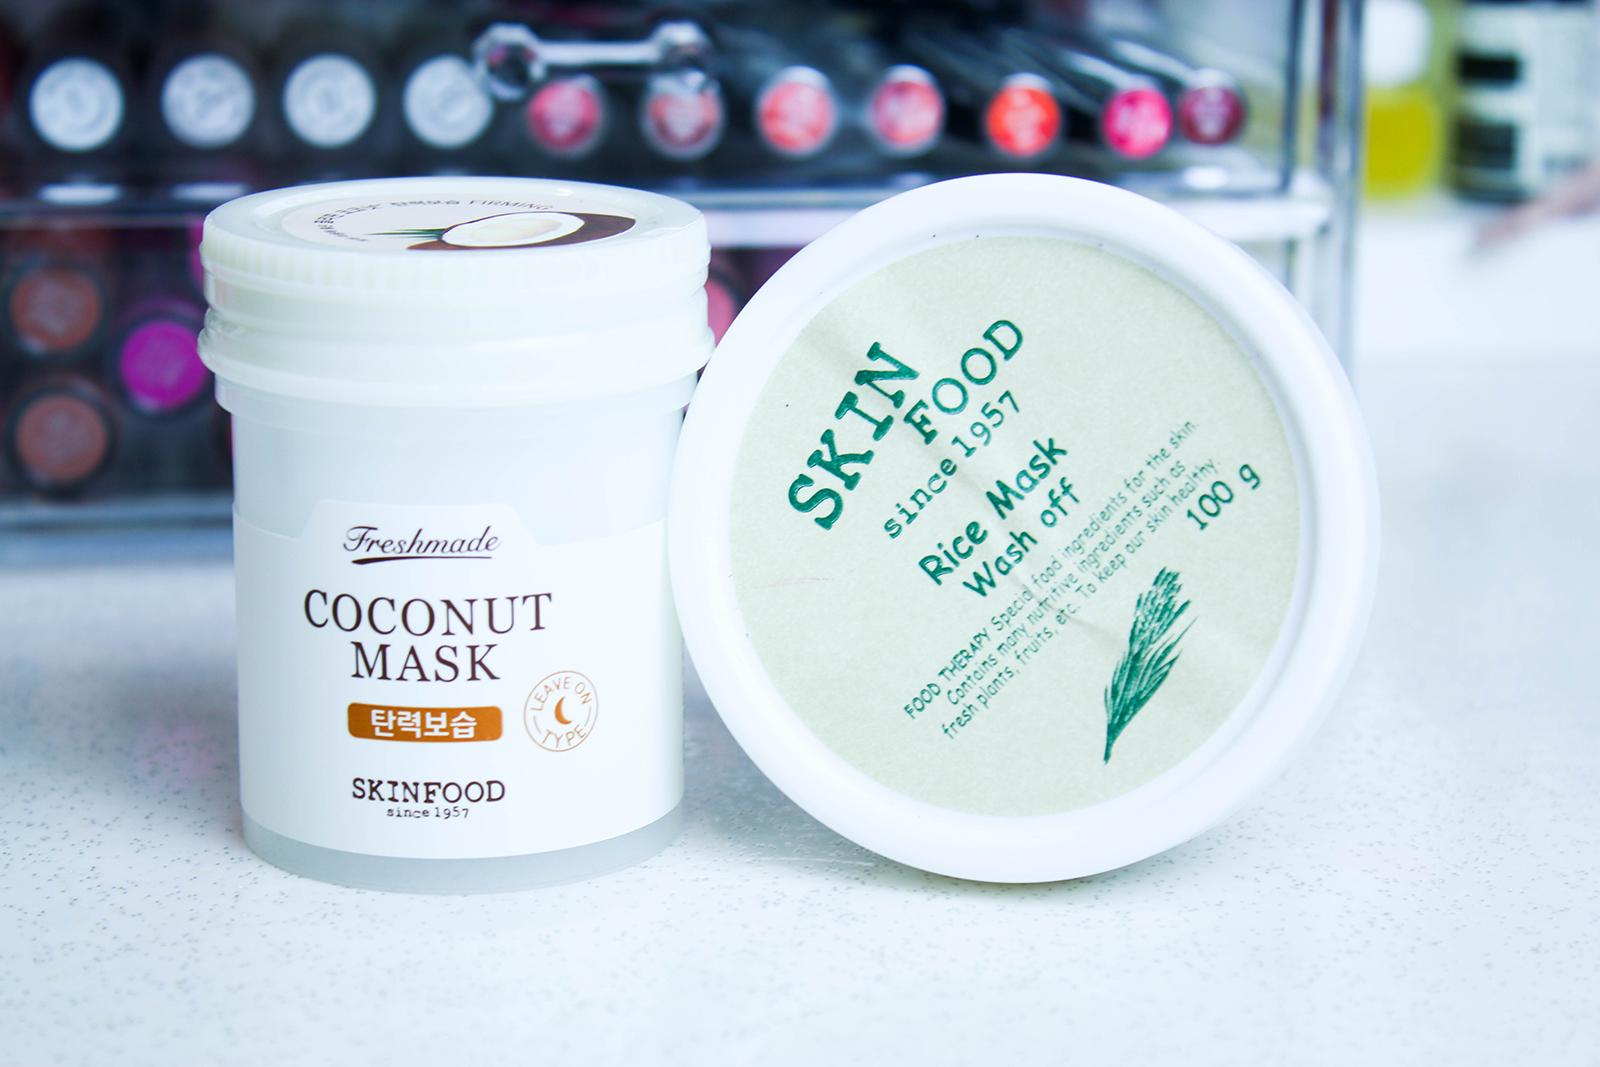 Skinfood Freshmade Coconut masque